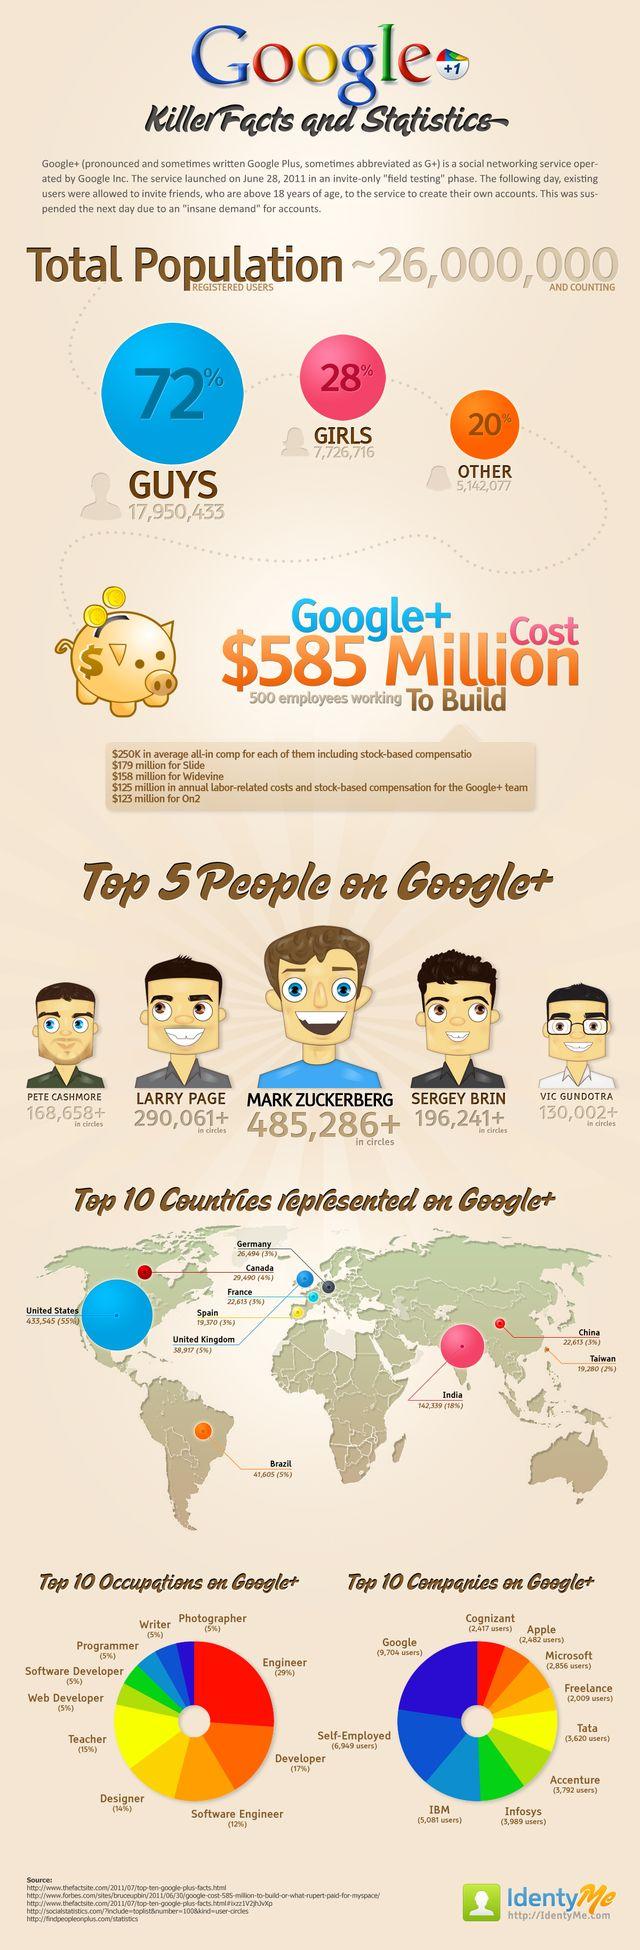 Infografia con estadisticas de Google Plus 2 Infografía con diferentes datos estadísticos de Google Plus